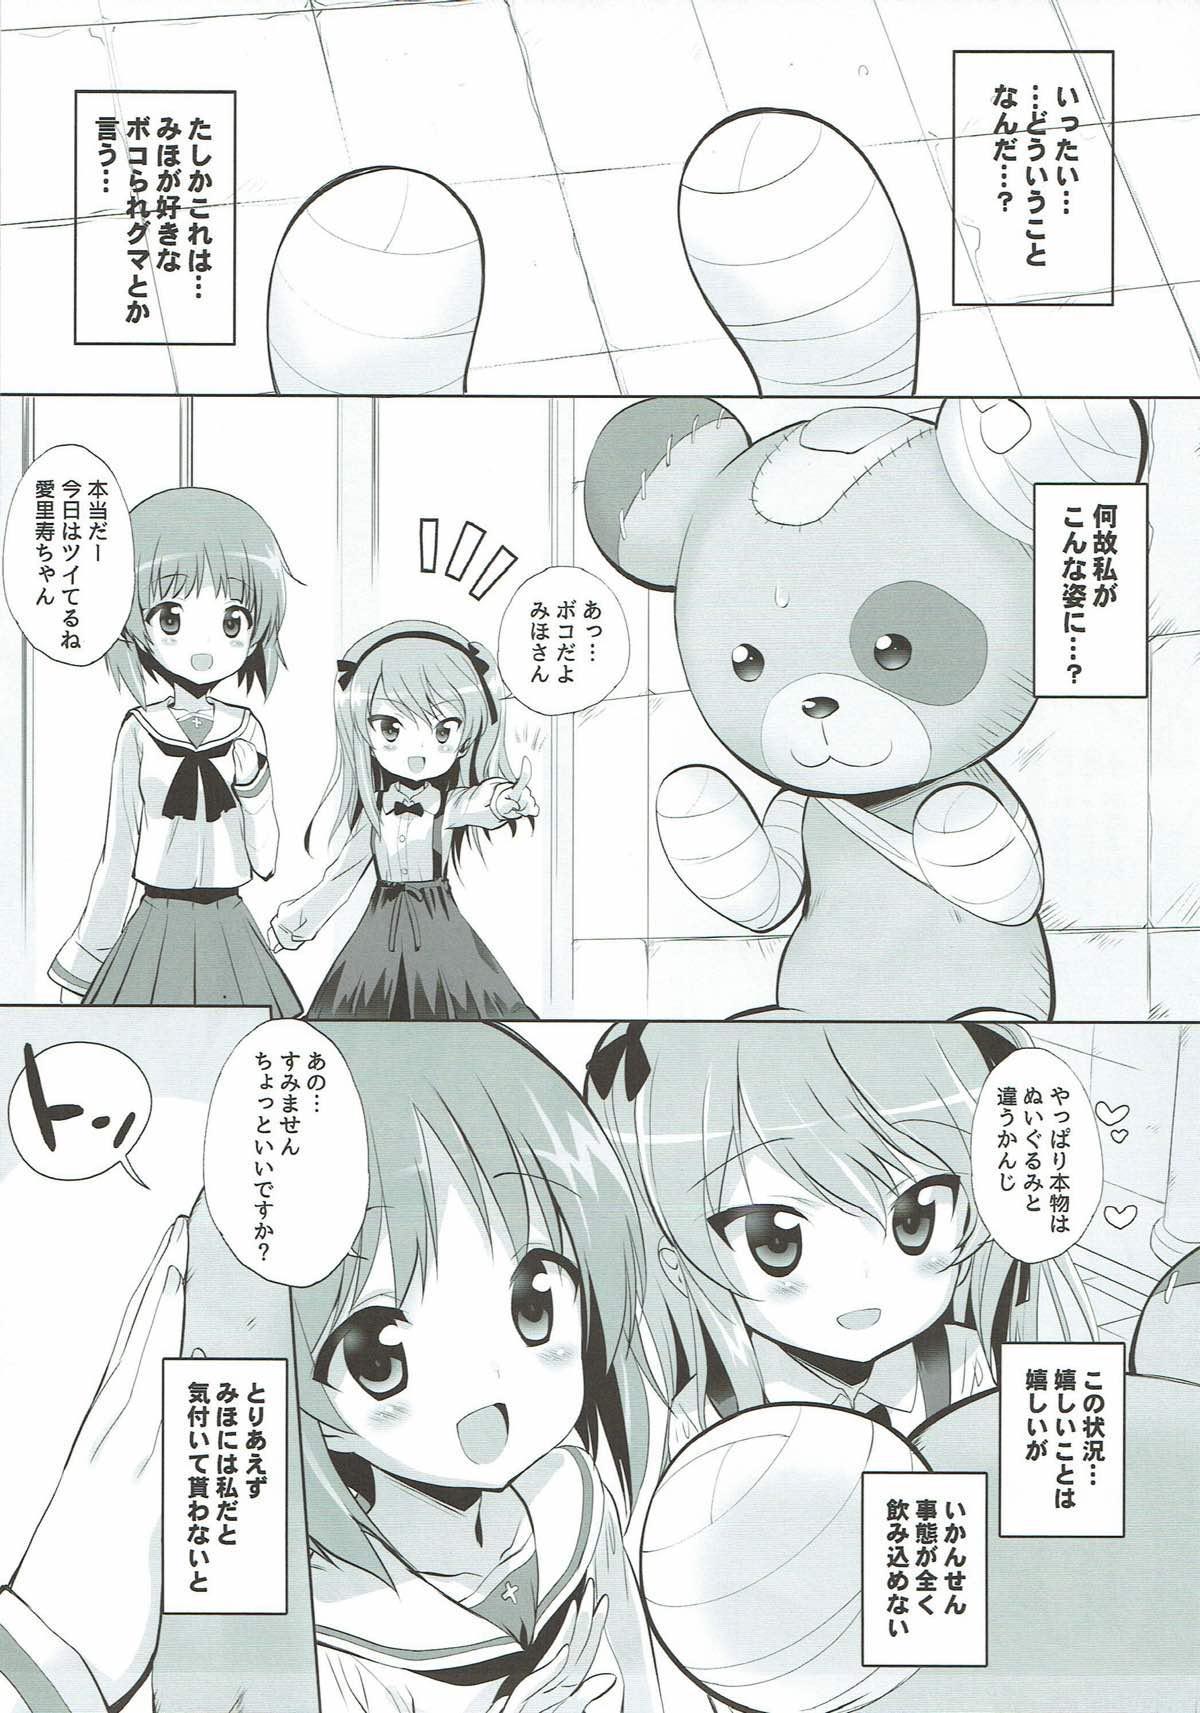 THE Senshoujo 3 21